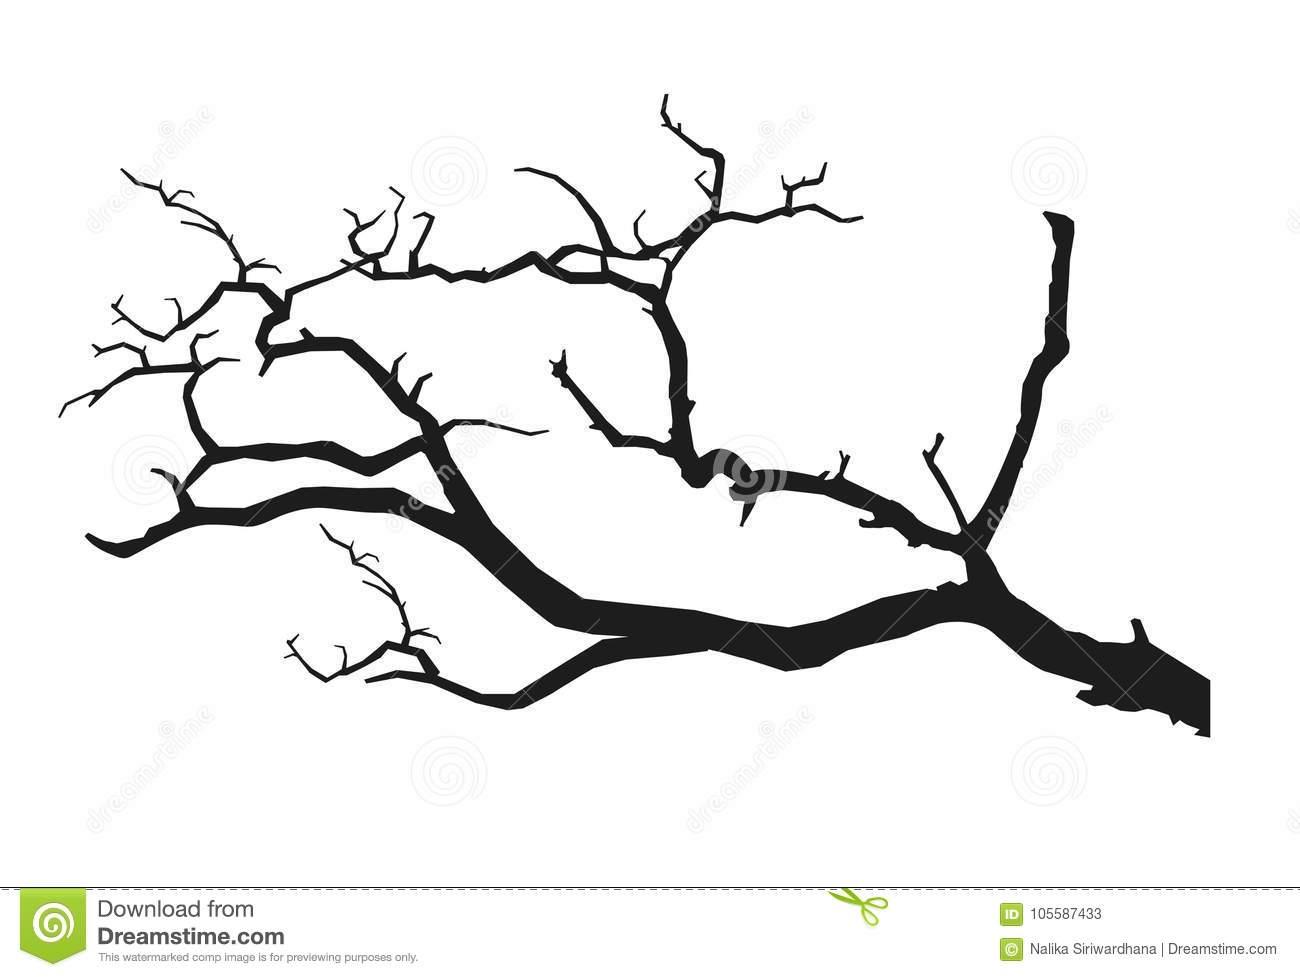 Black tree branch stock vector. Illustration of clipart.